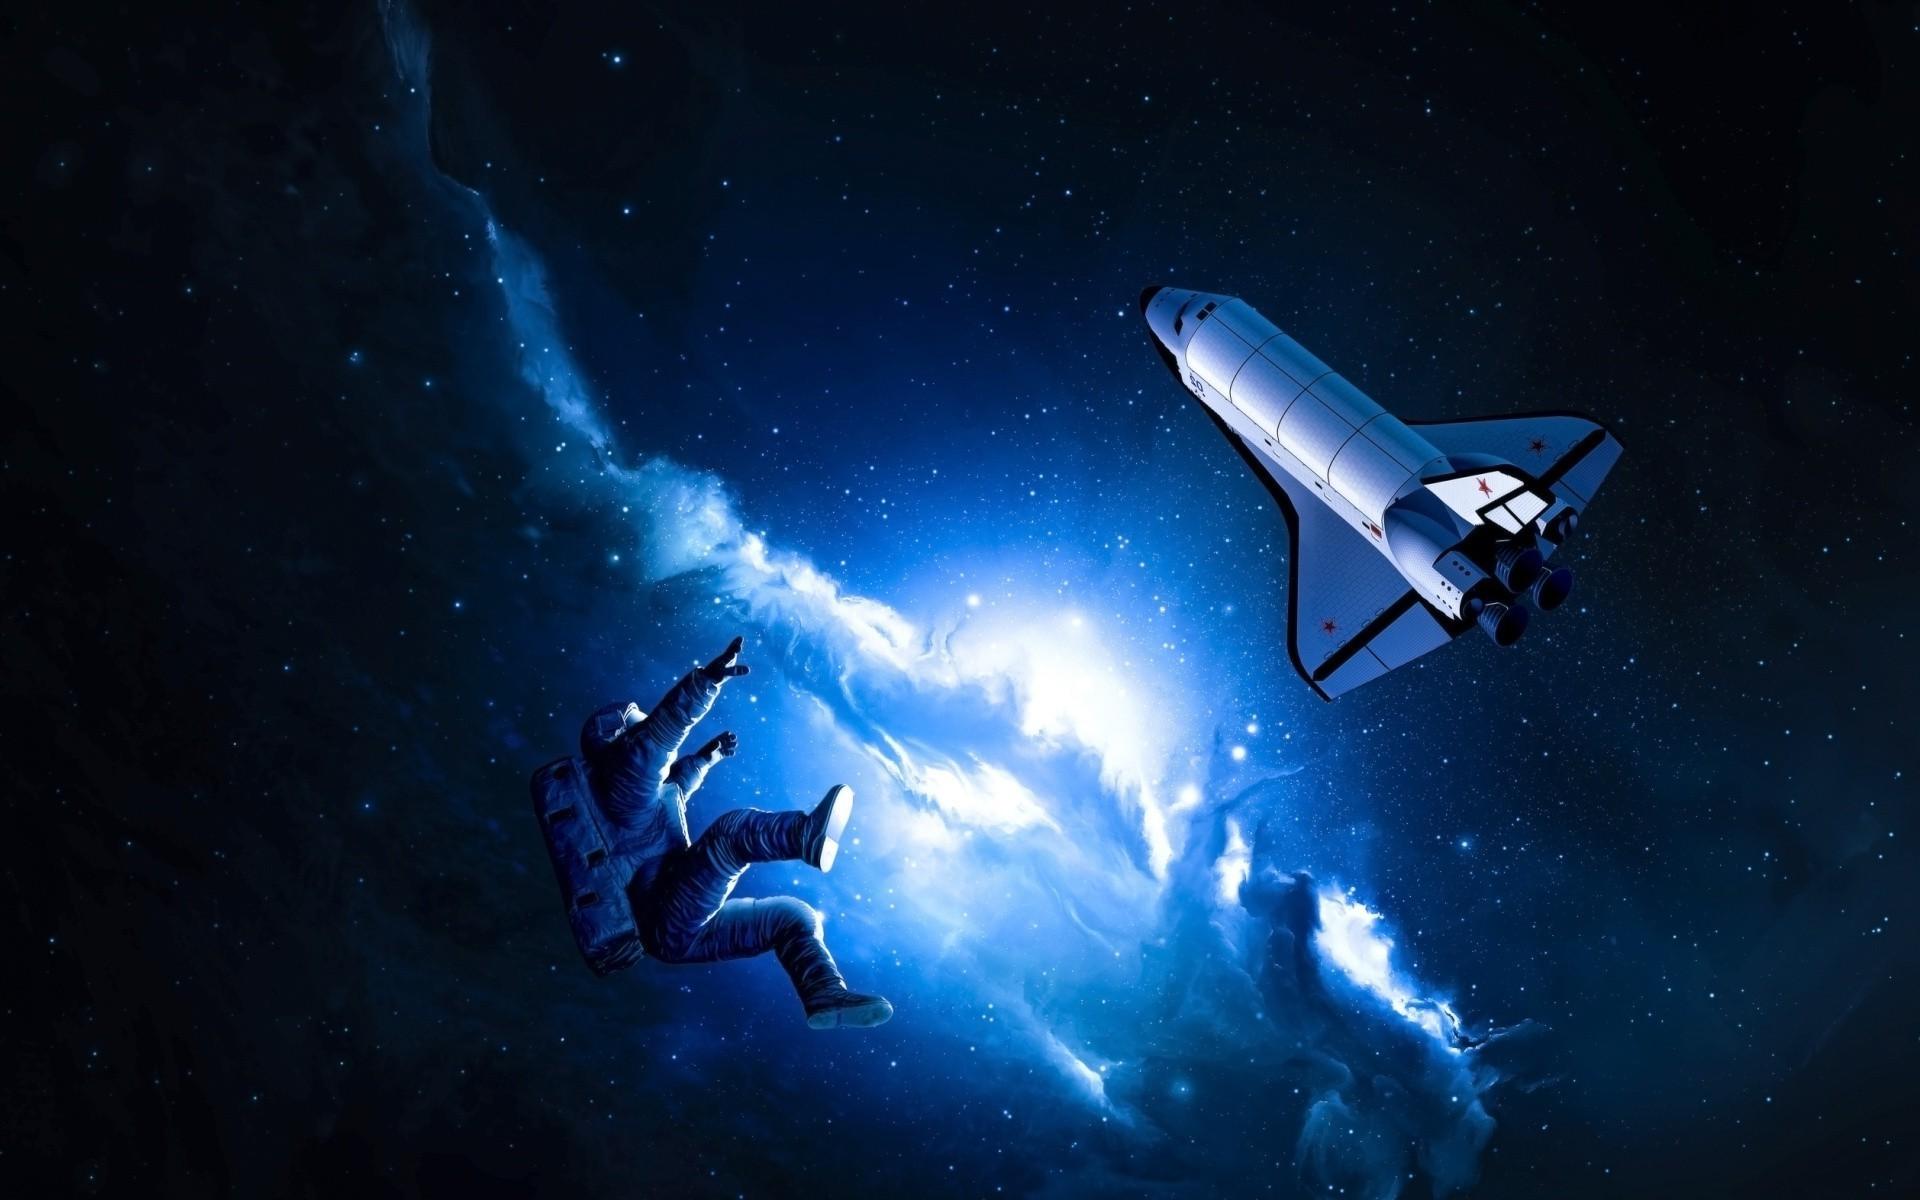 space, Space Shuttle, Space Art, Nebula, Blue, Stars, Astronaut Wallpaper